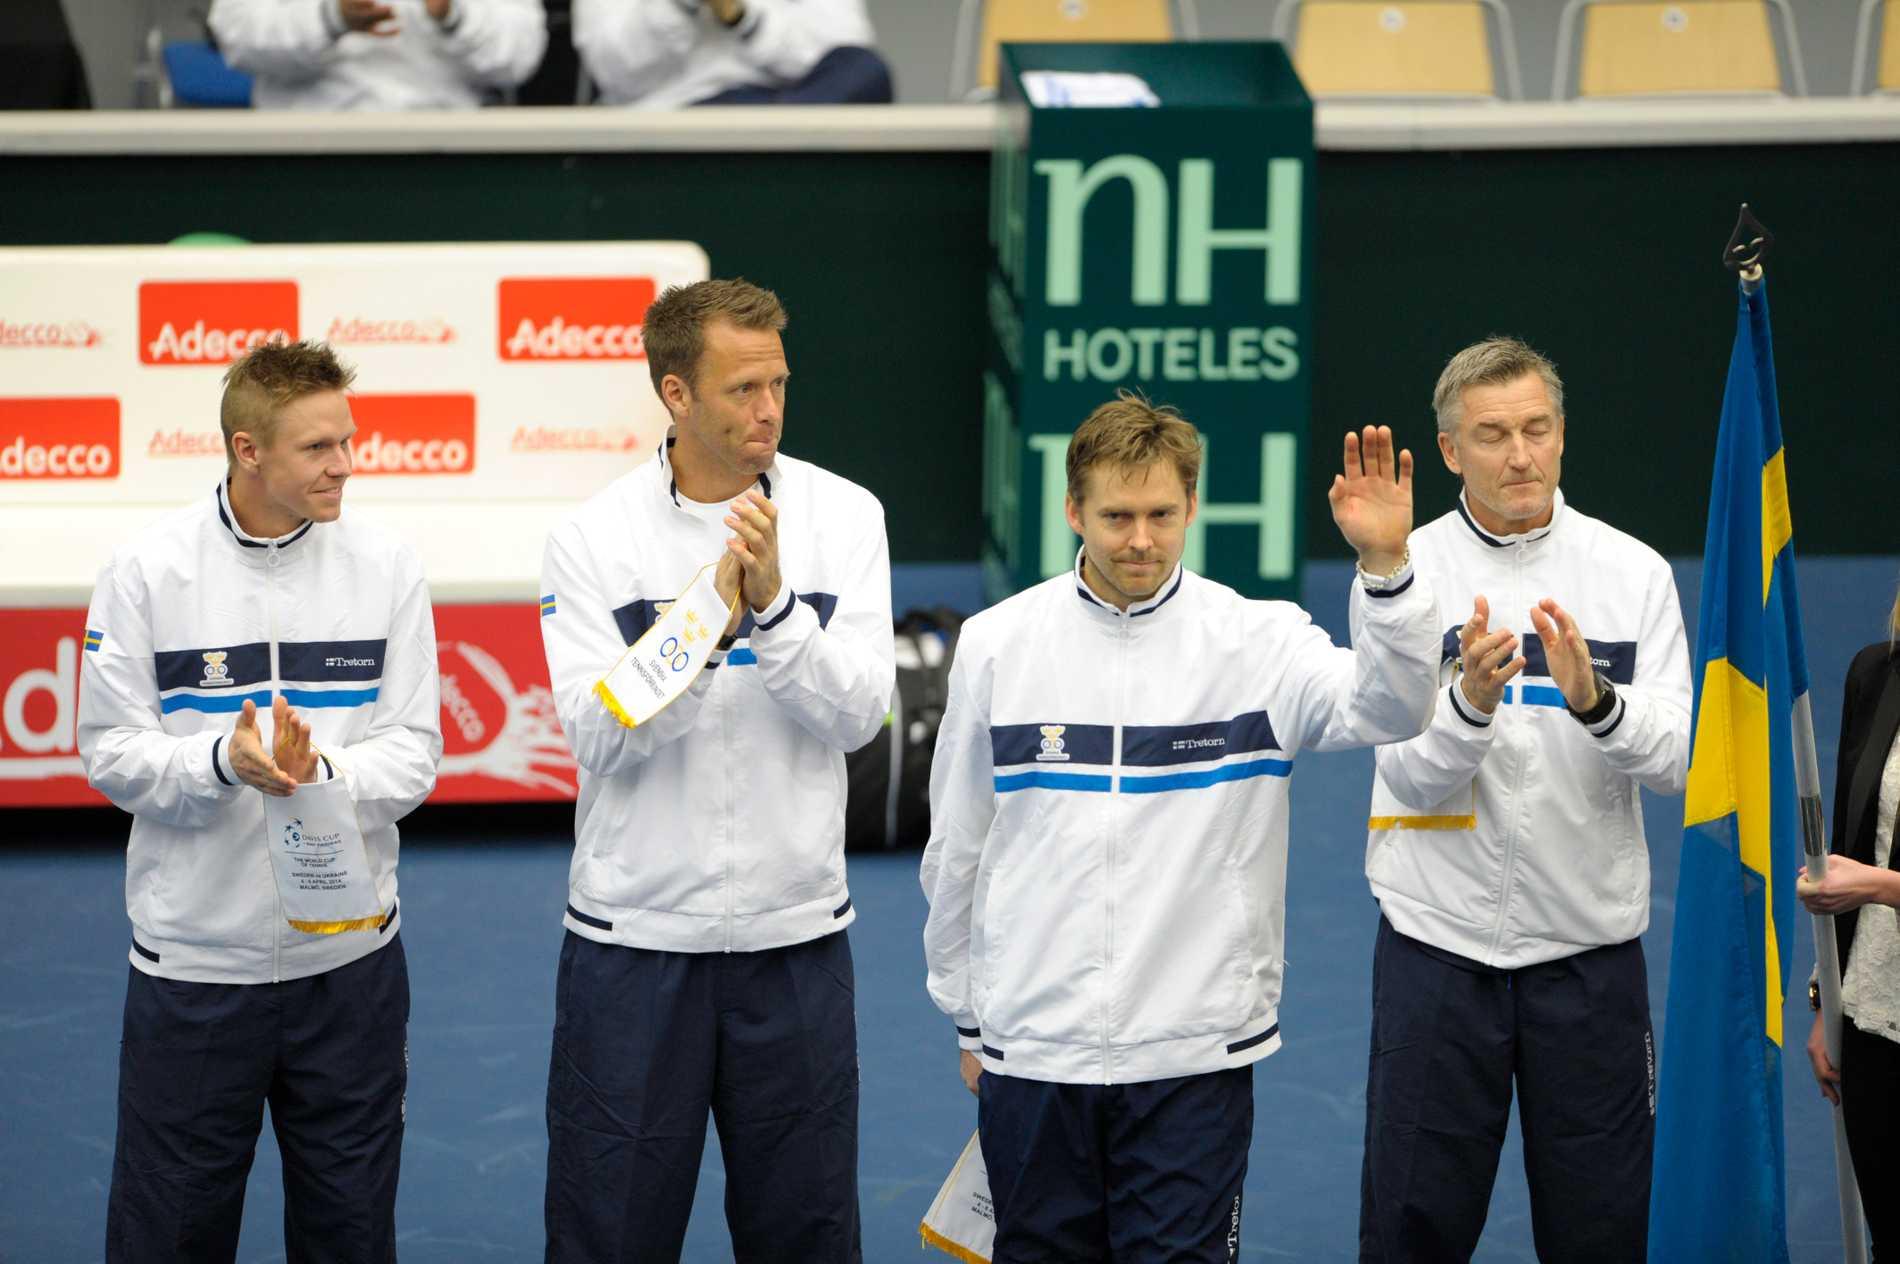 Sveriges lag, från vänster Markus Eriksson, Robert Lindstedt, Johan Brunström pch lagkapten Fidde Rosengren.